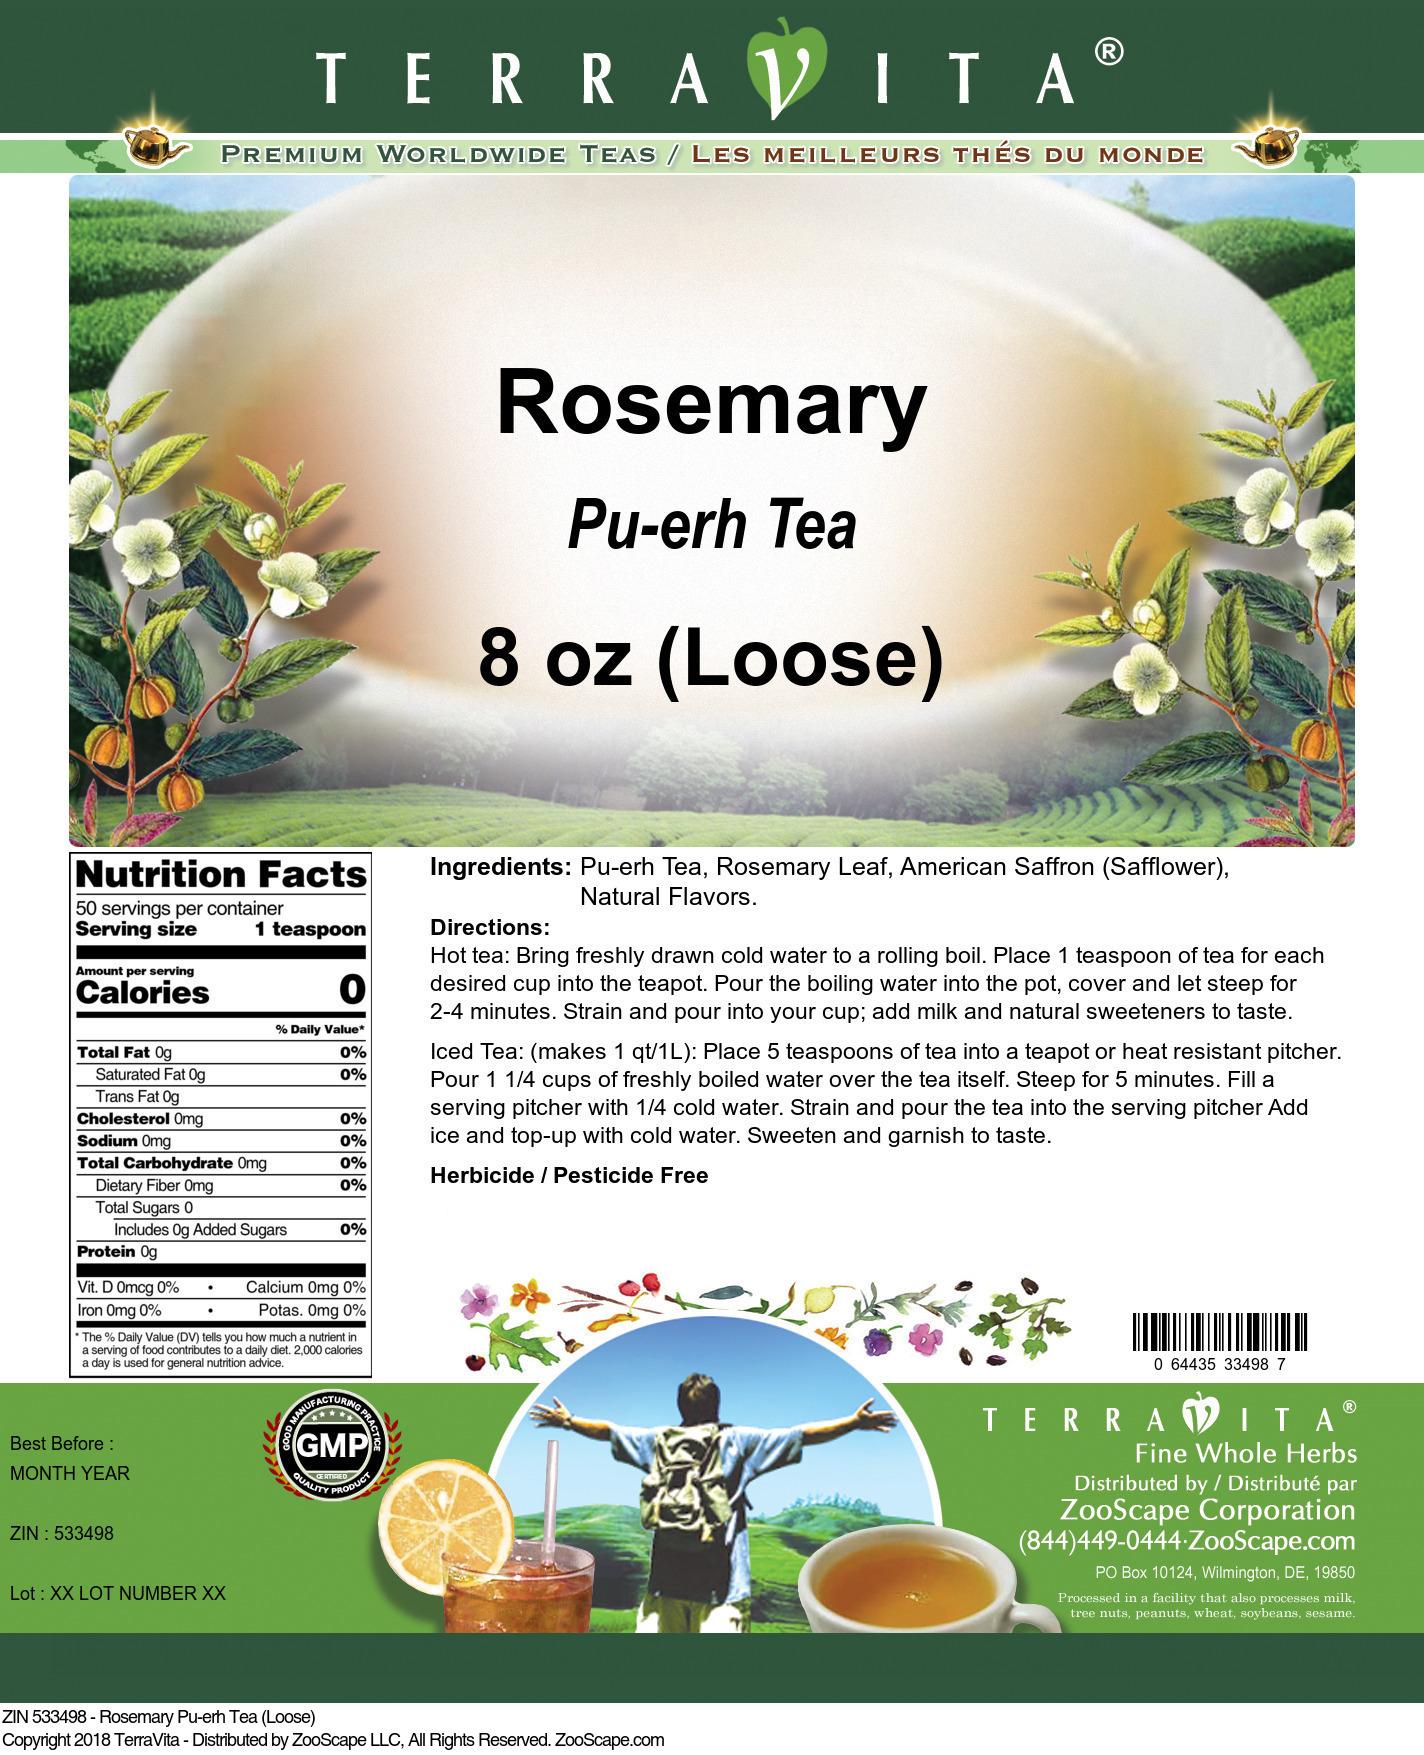 Rosemary Pu-erh Tea (Loose)